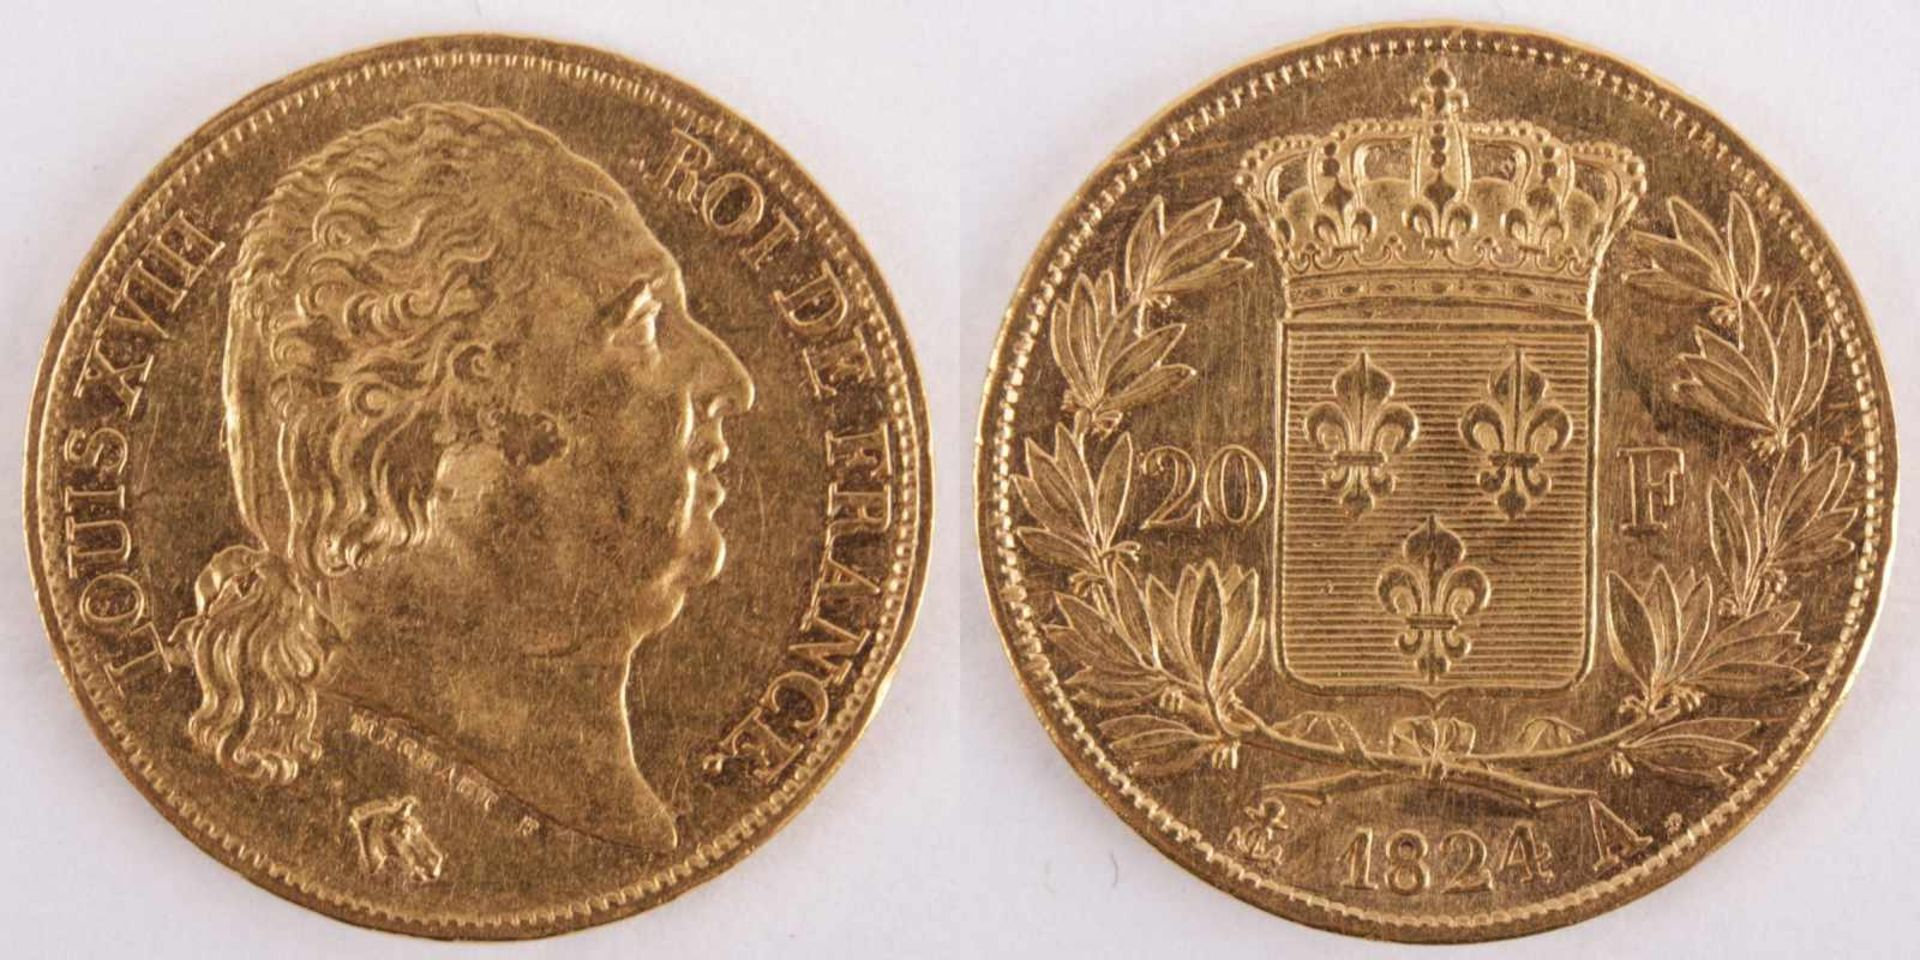 Los 10 - Gold coin: 20 Franc 1824 France, 20 Franc, Louis XVIII, MICHAUT F, year 1824, gold coin, 900/1000